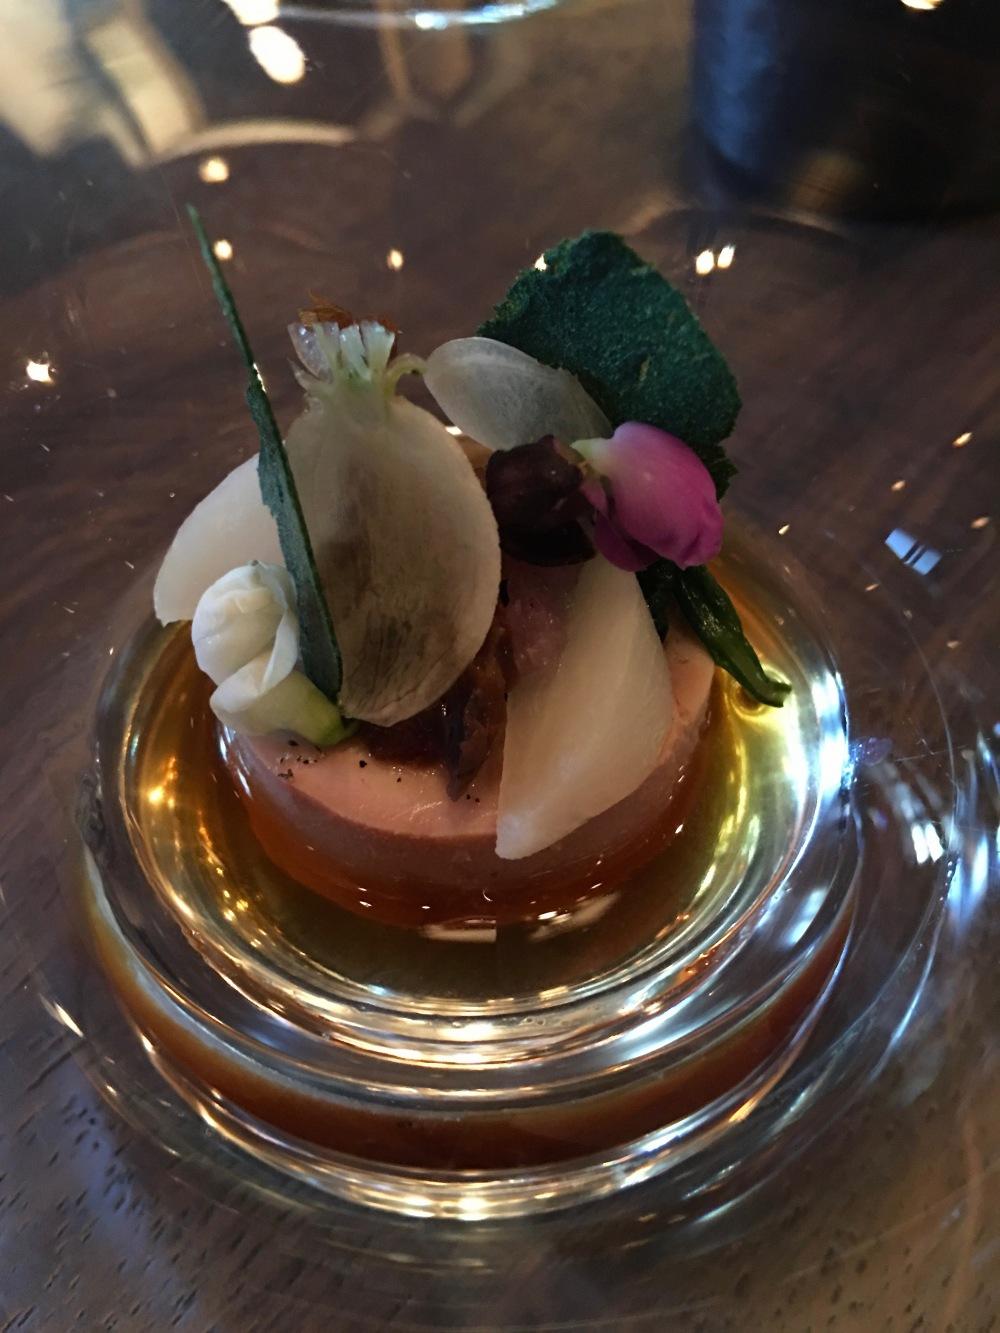 STF foie gras